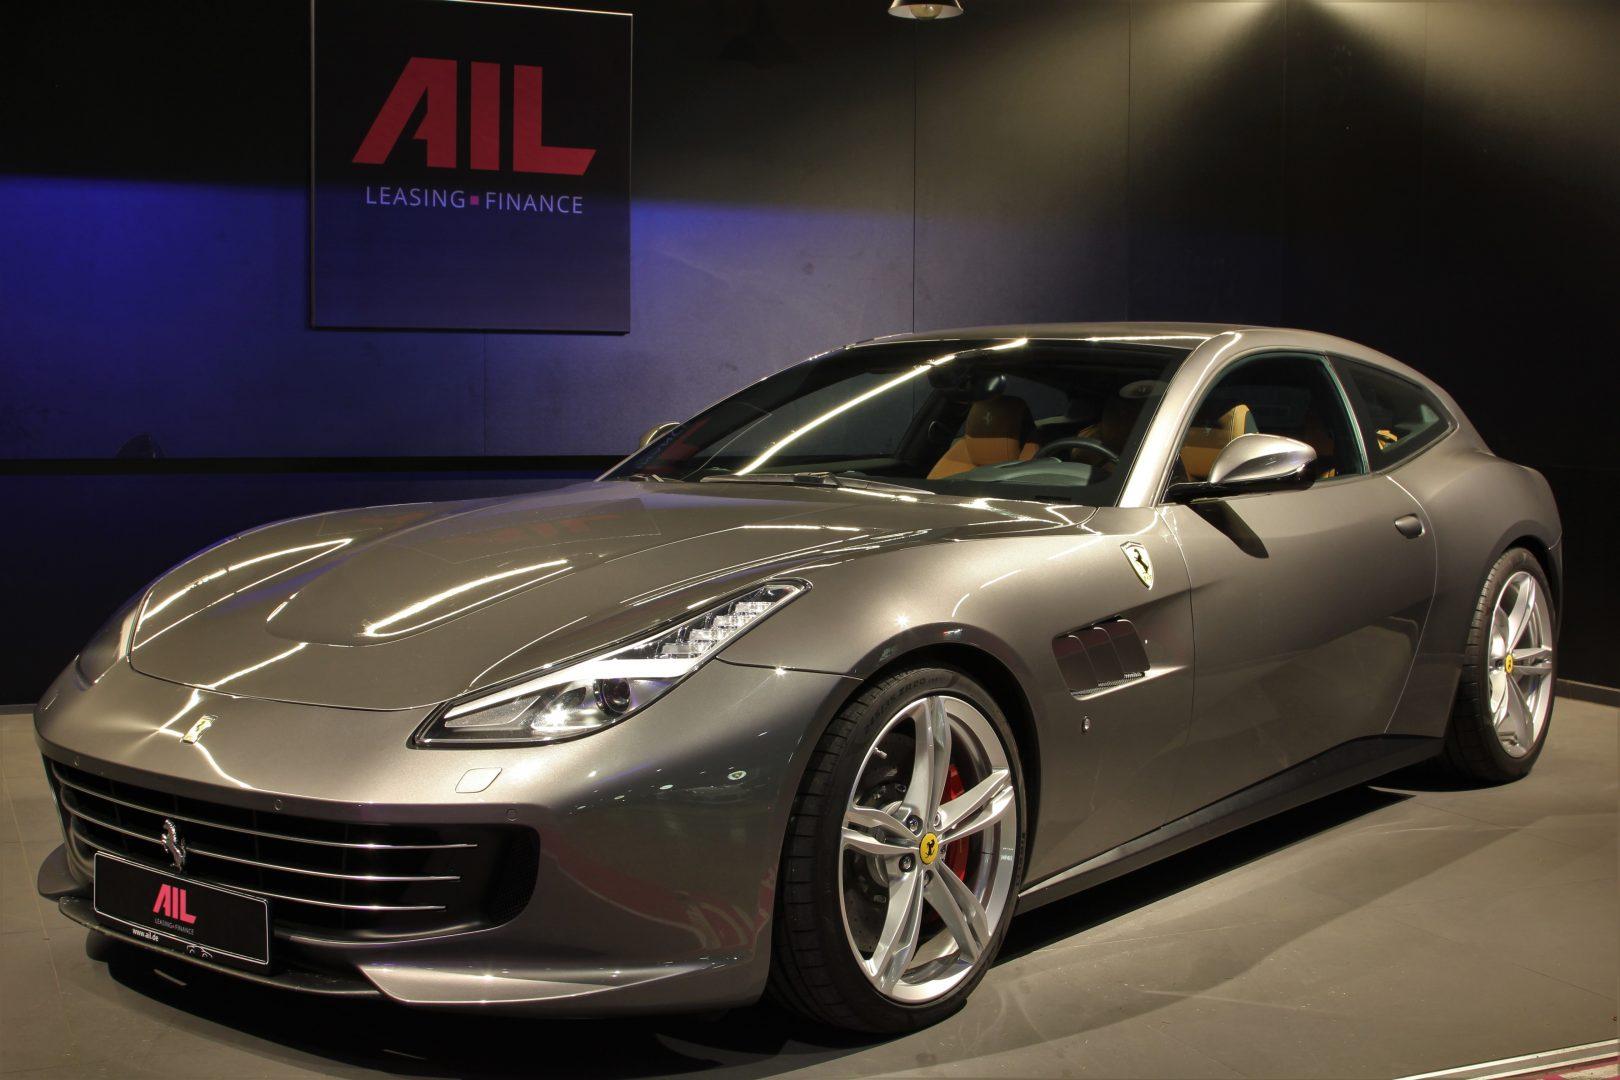 AIL Ferrari GTC4Lusso 14